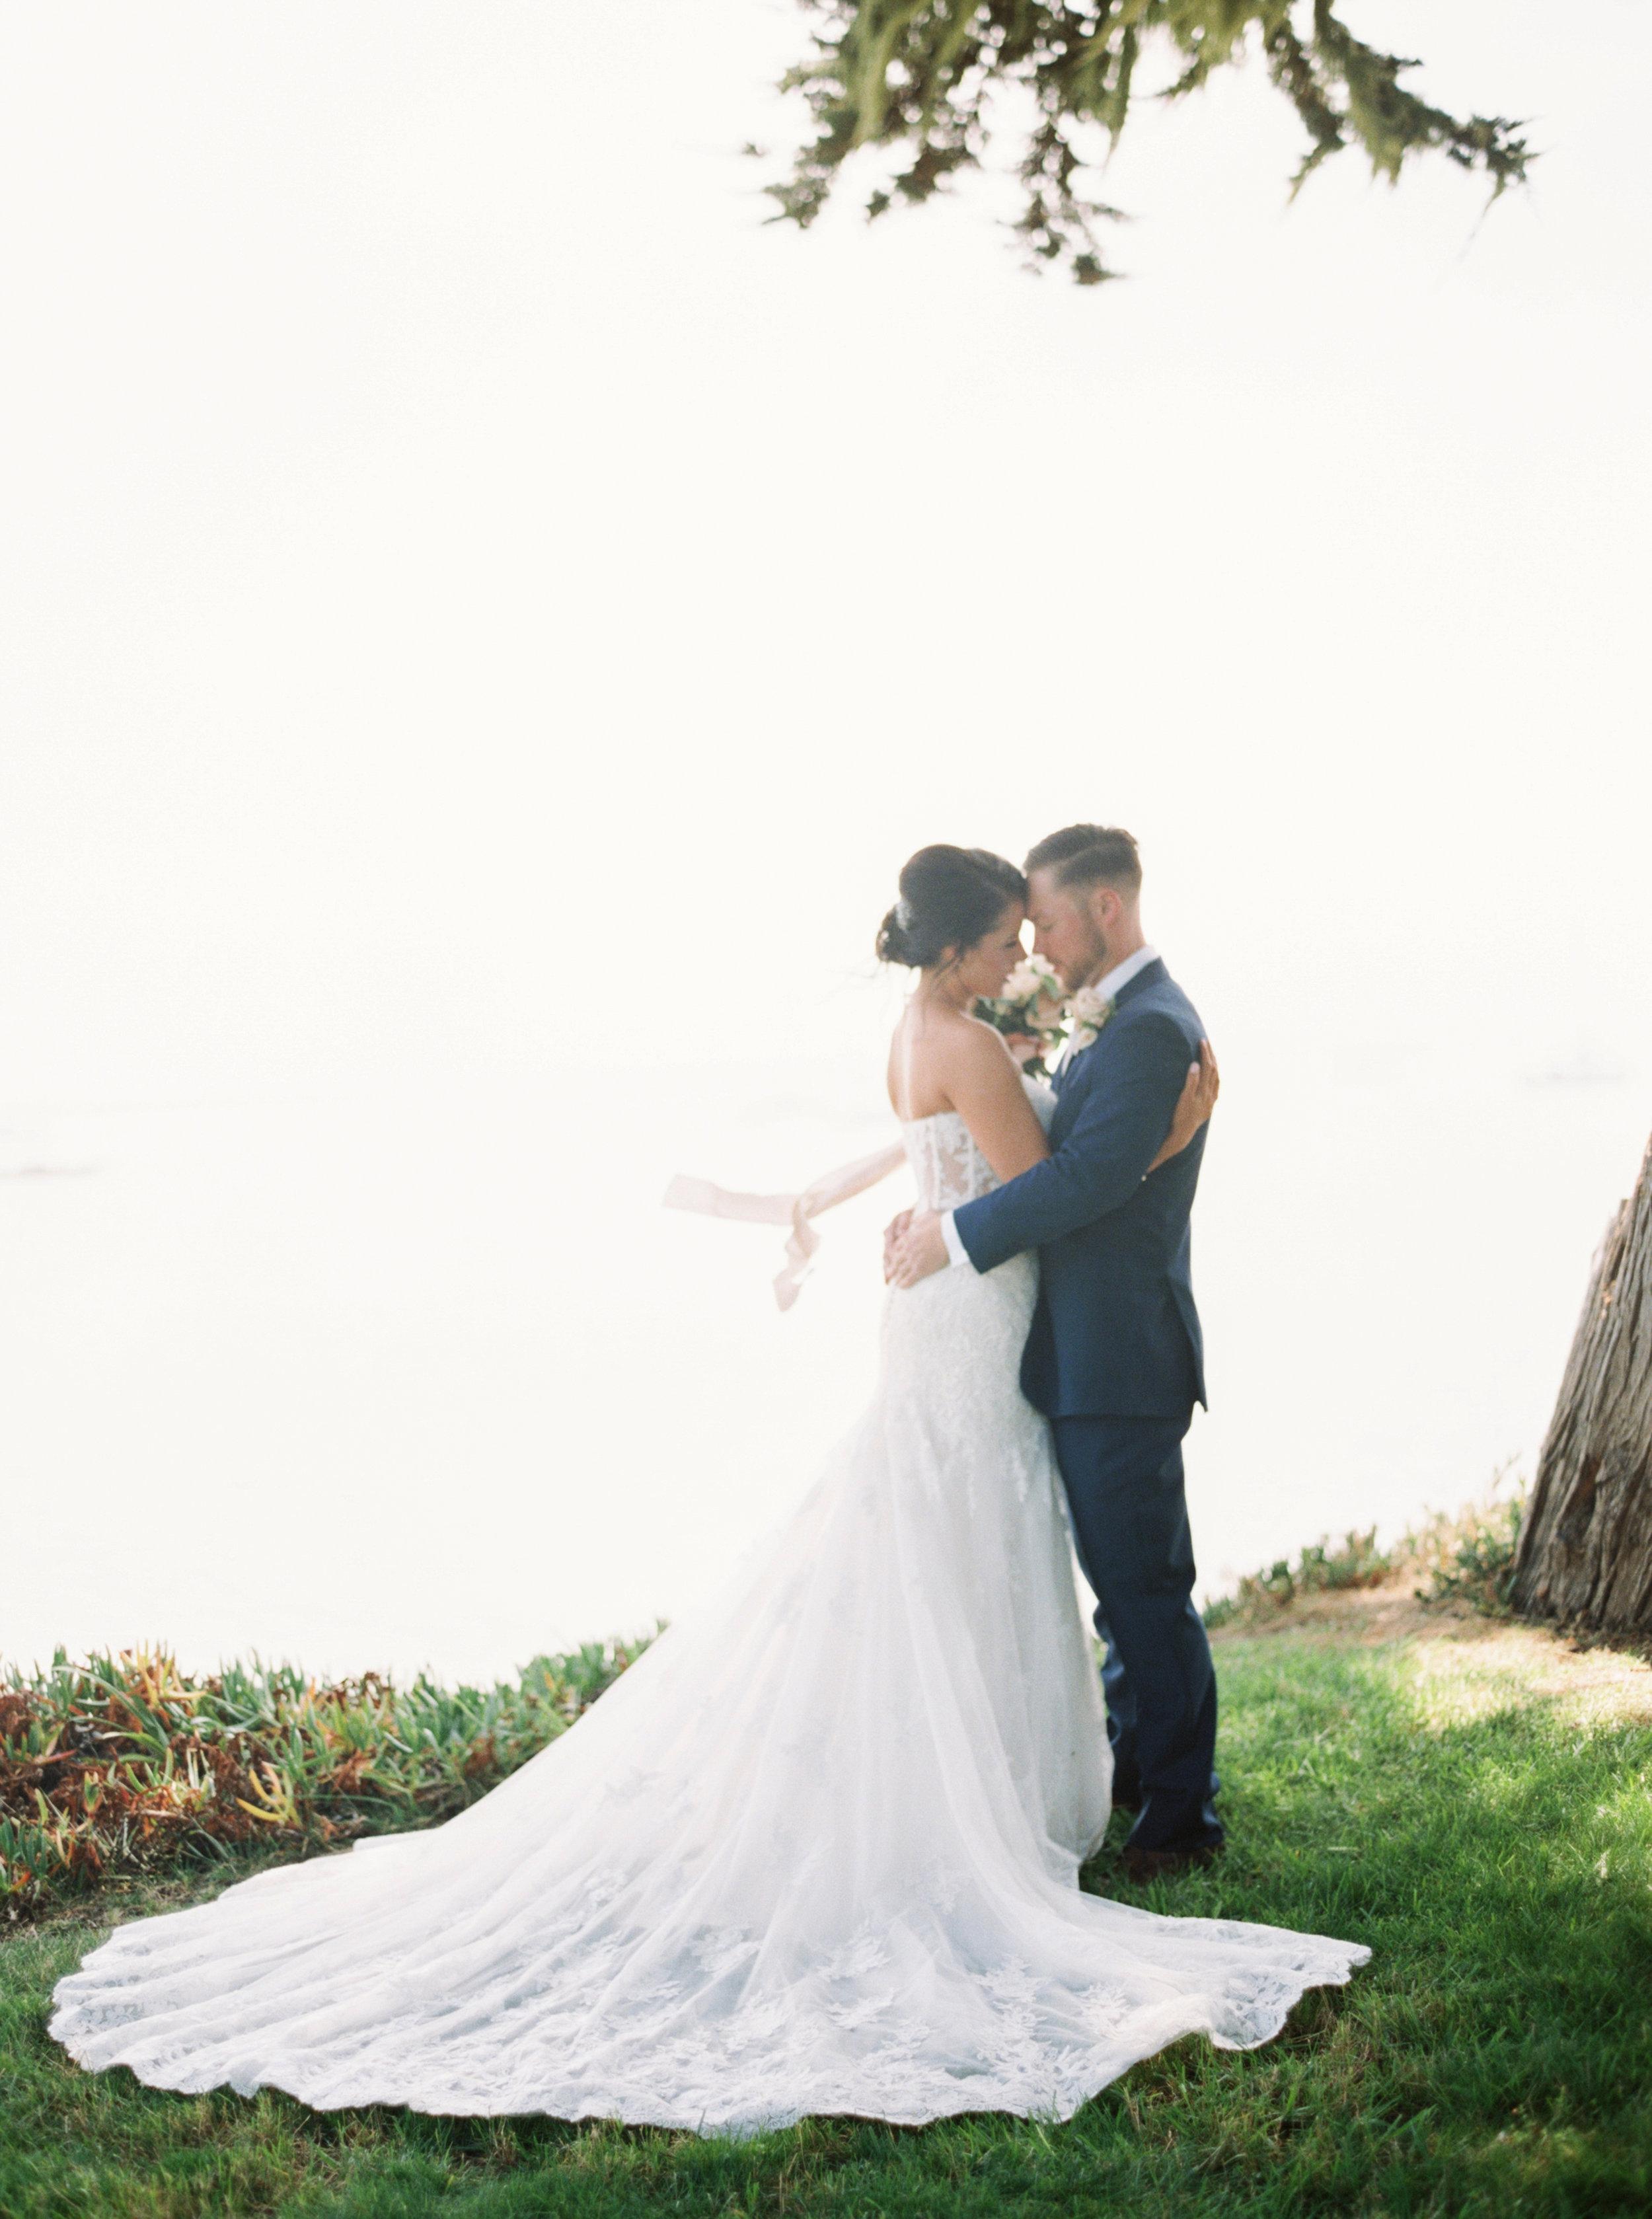 trynhphoto_socal_sf_halfmoon_bay_wedding_photographer_JA-118.jpg